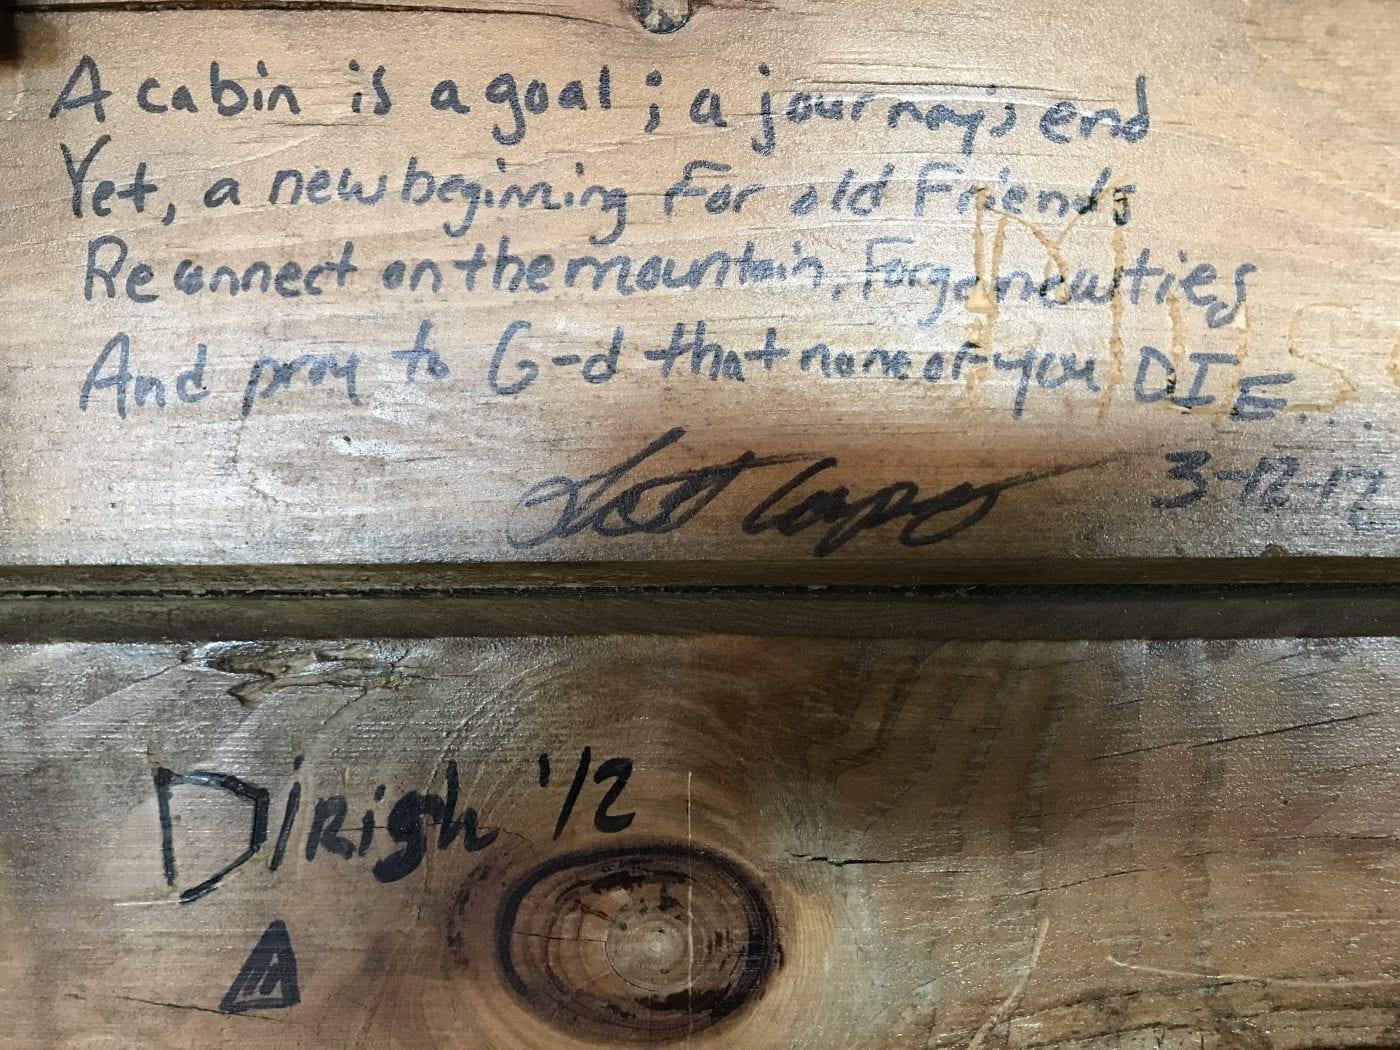 Graffiti in Thomas Mountain cabin